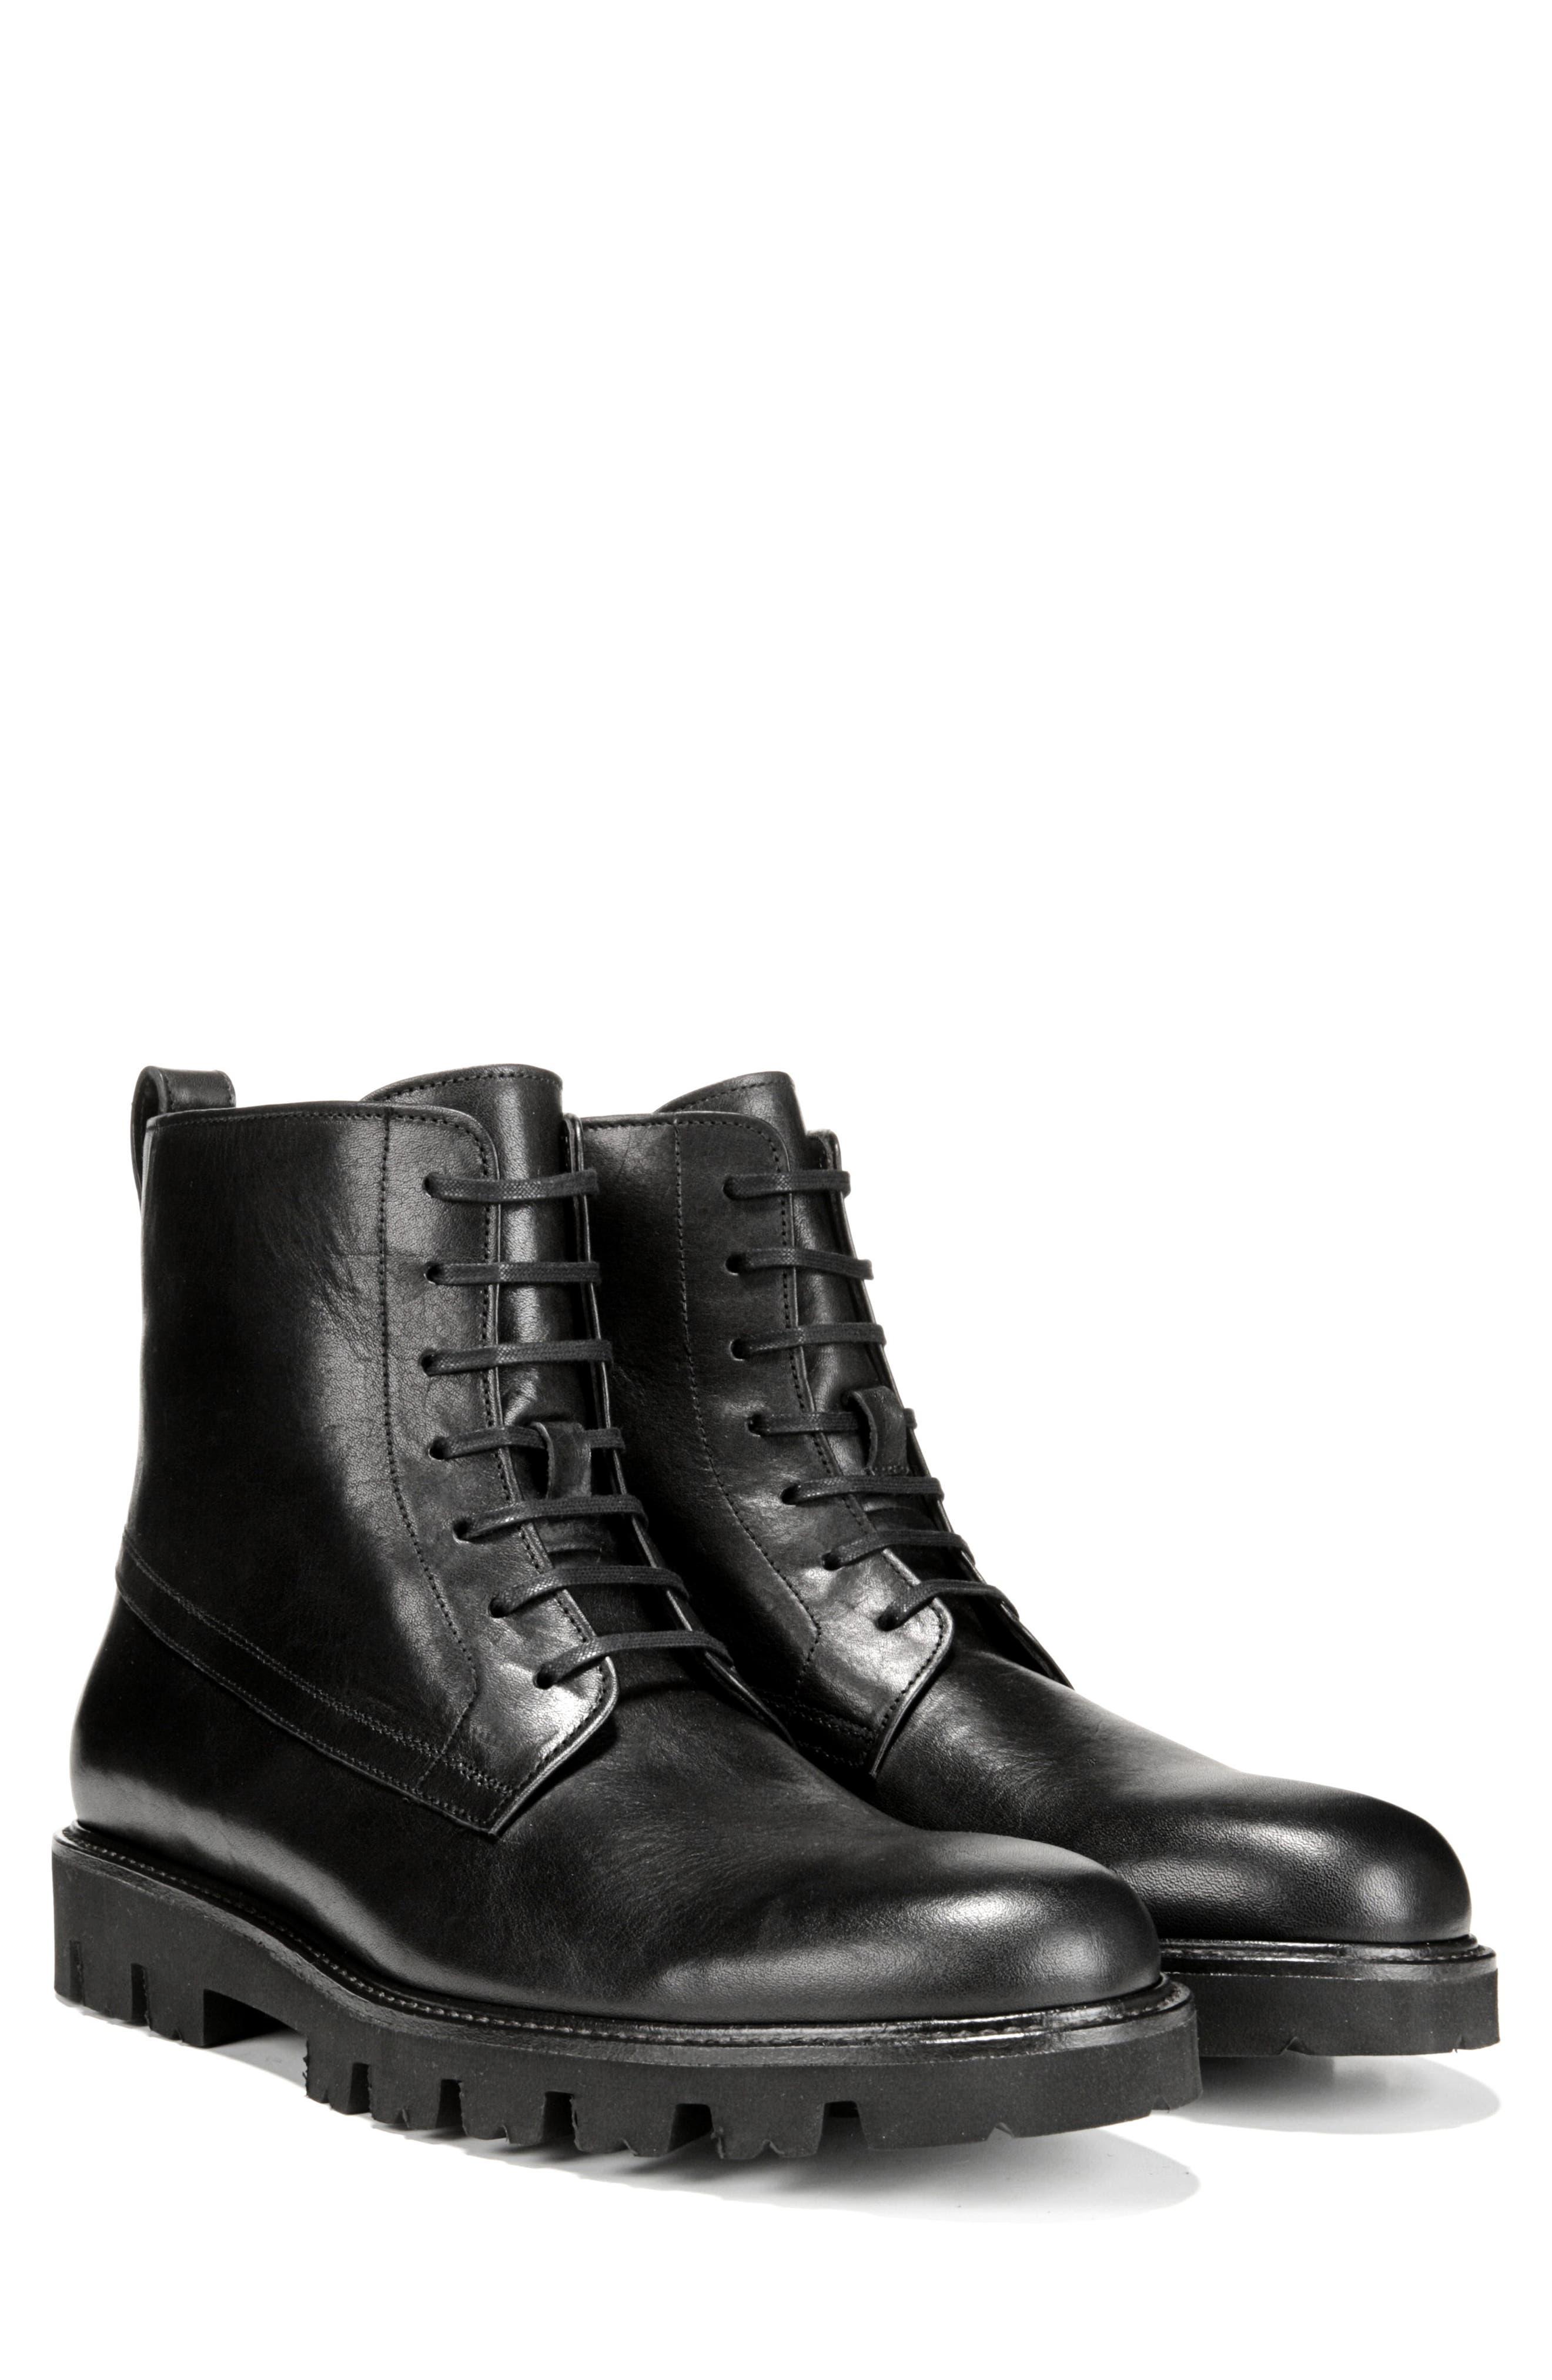 Commander Plain Toe Boot,                             Alternate thumbnail 9, color,                             BLACK